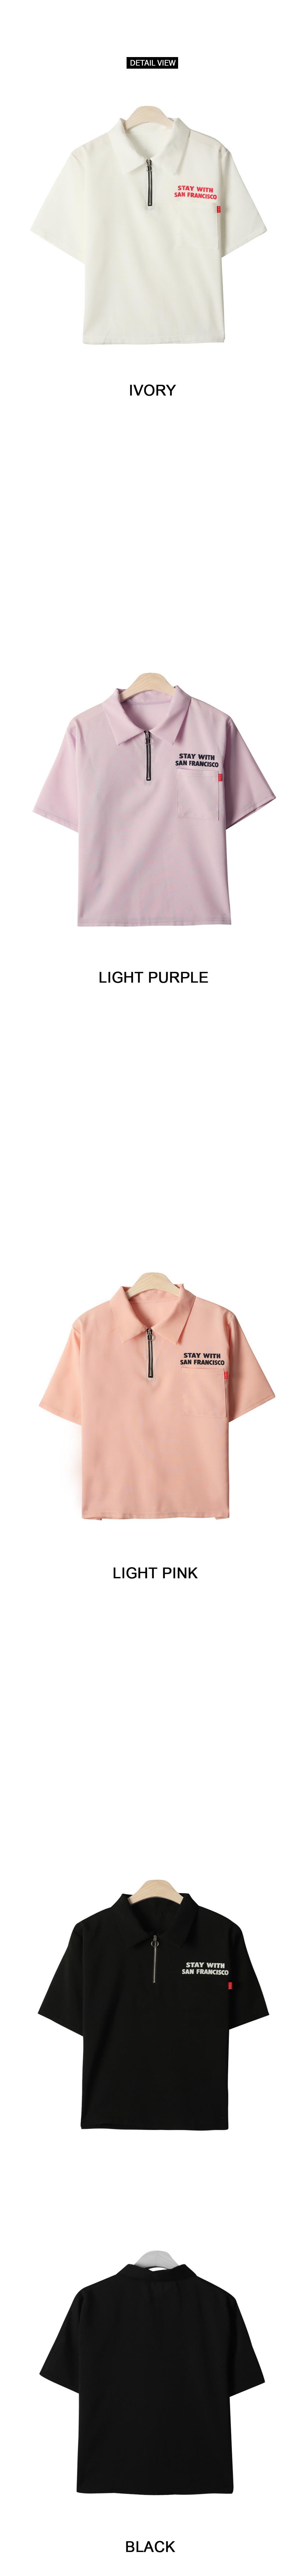 Staying ring short-sleeved shirt